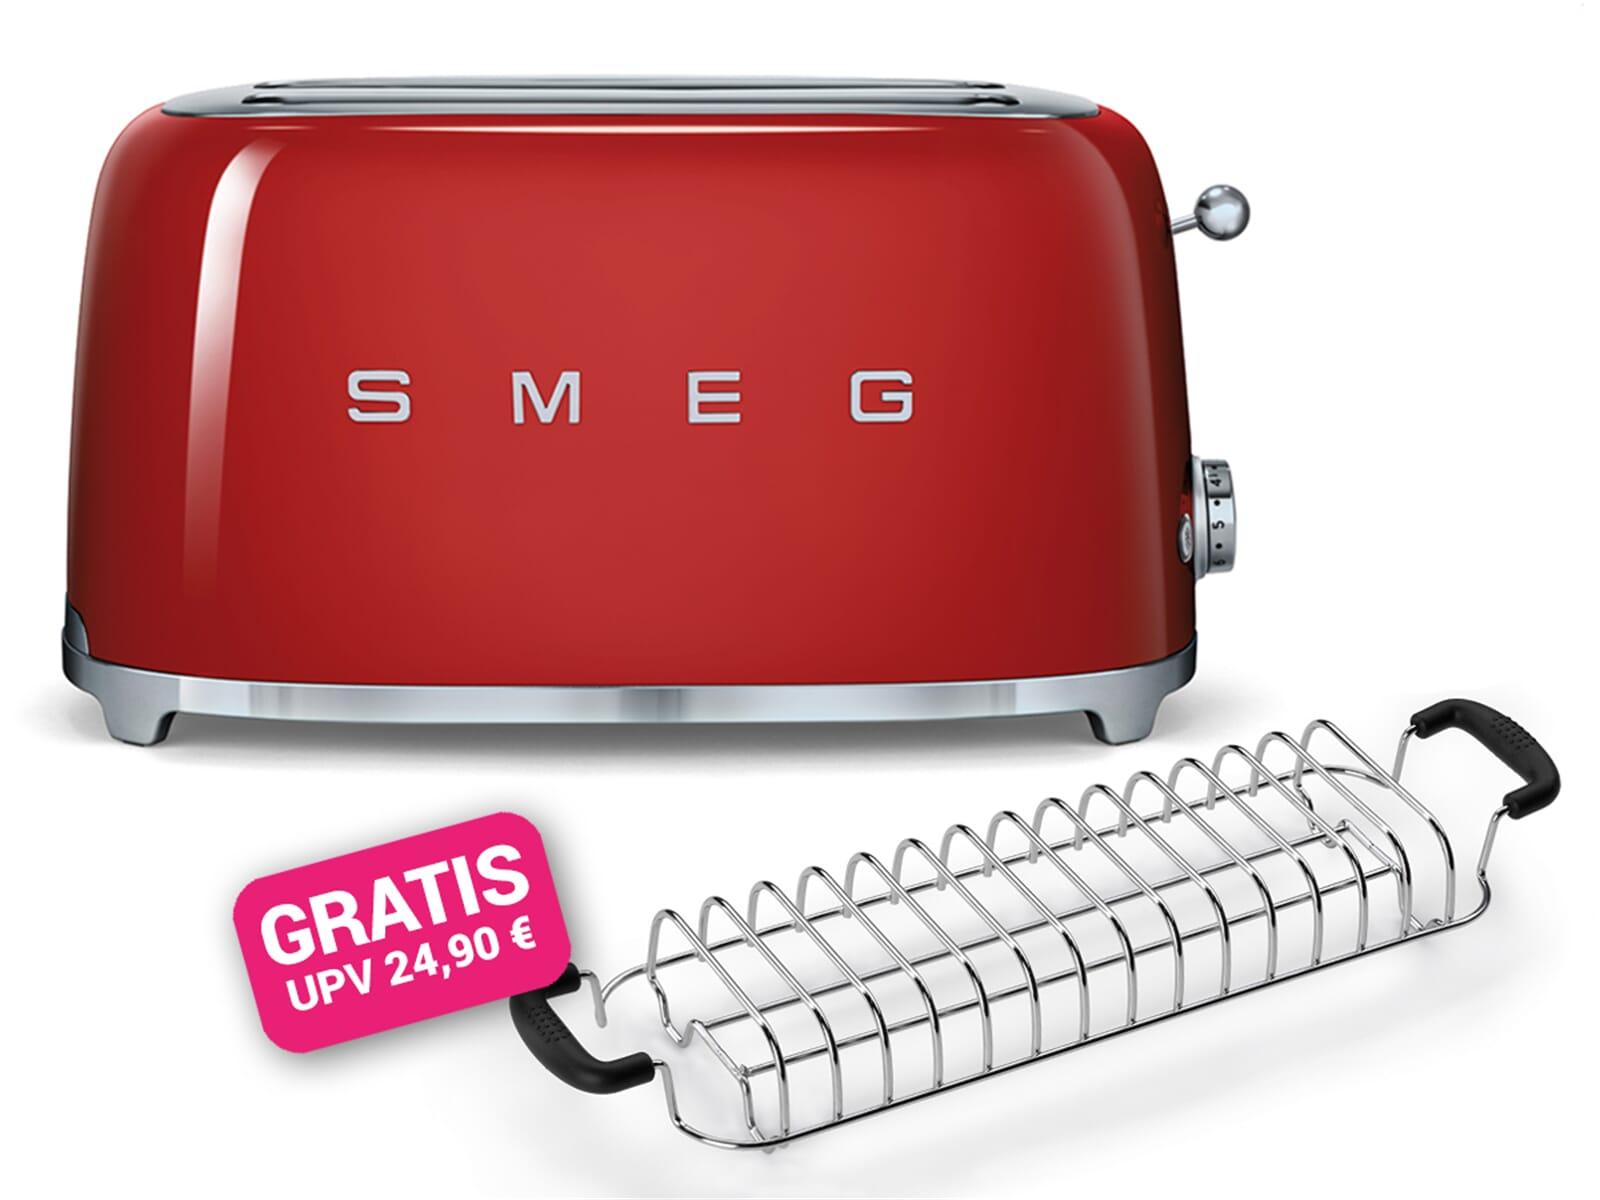 Smeg Kühlschrank Rot : Smeg tsf rdeu scheiben toaster rot inkl gratis brötchen